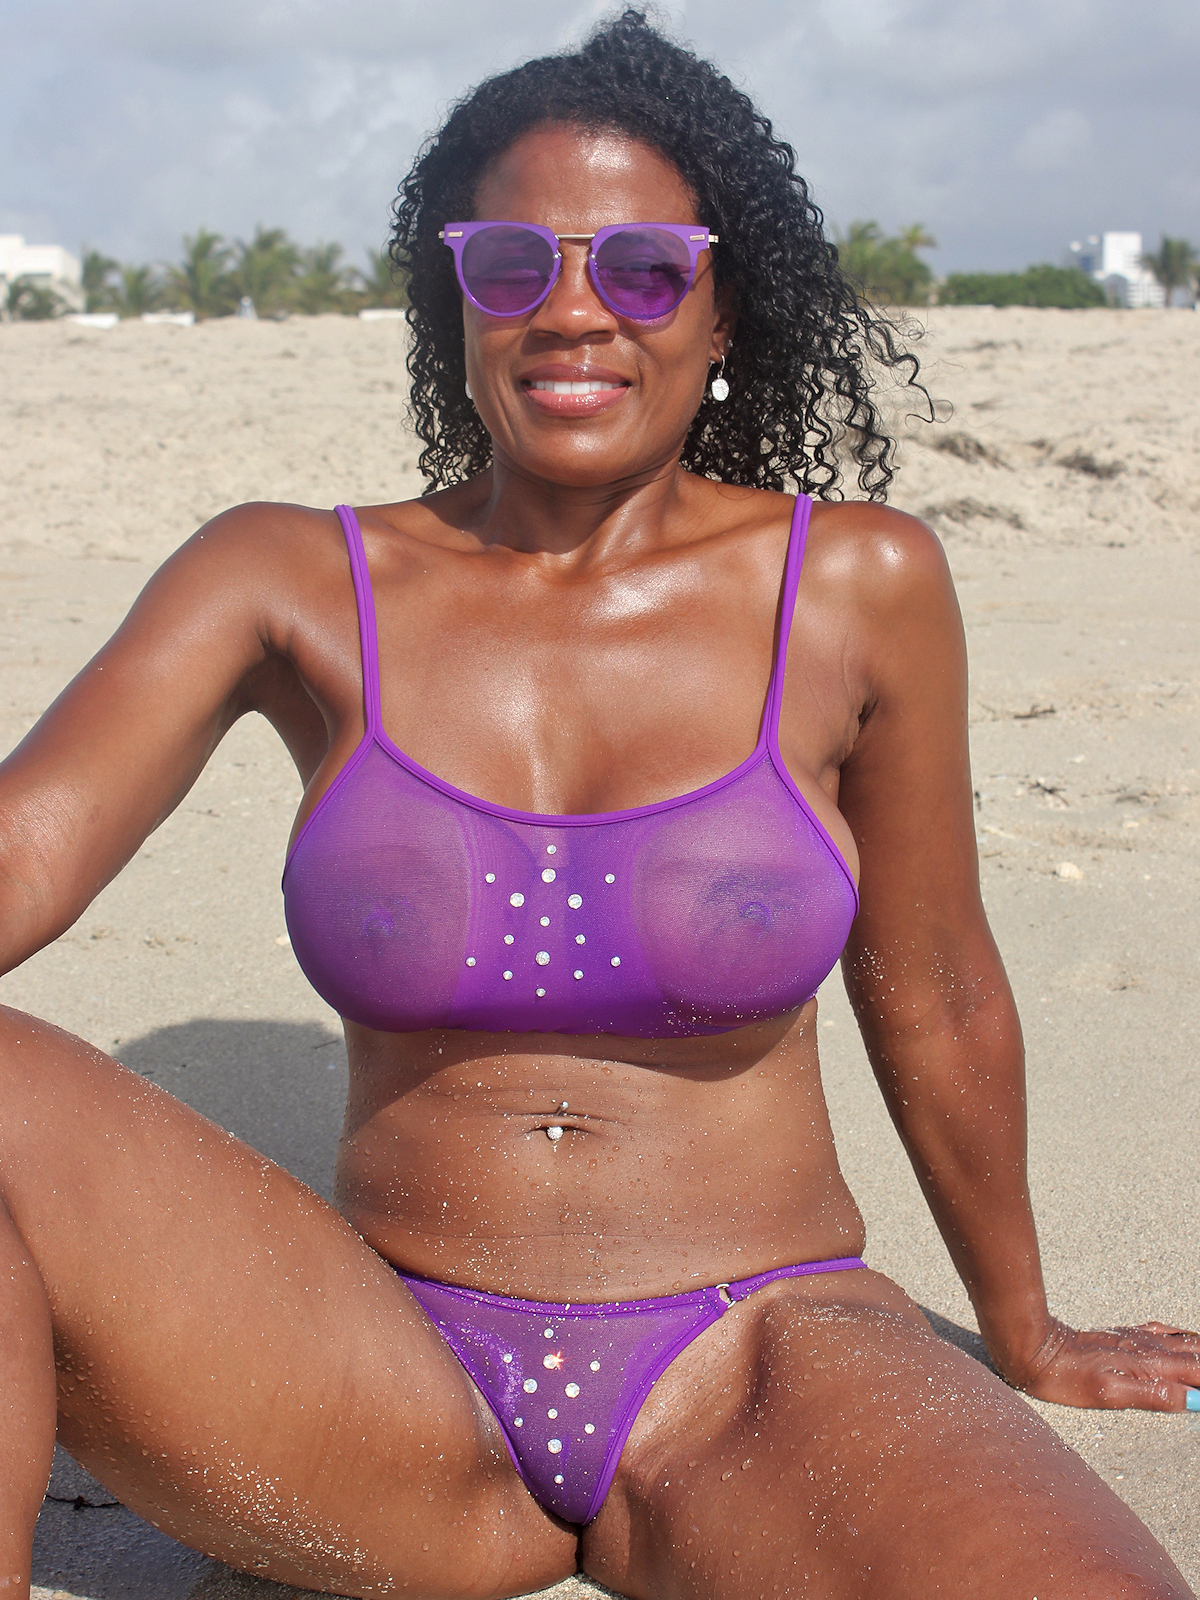 bikini-contest-see-through